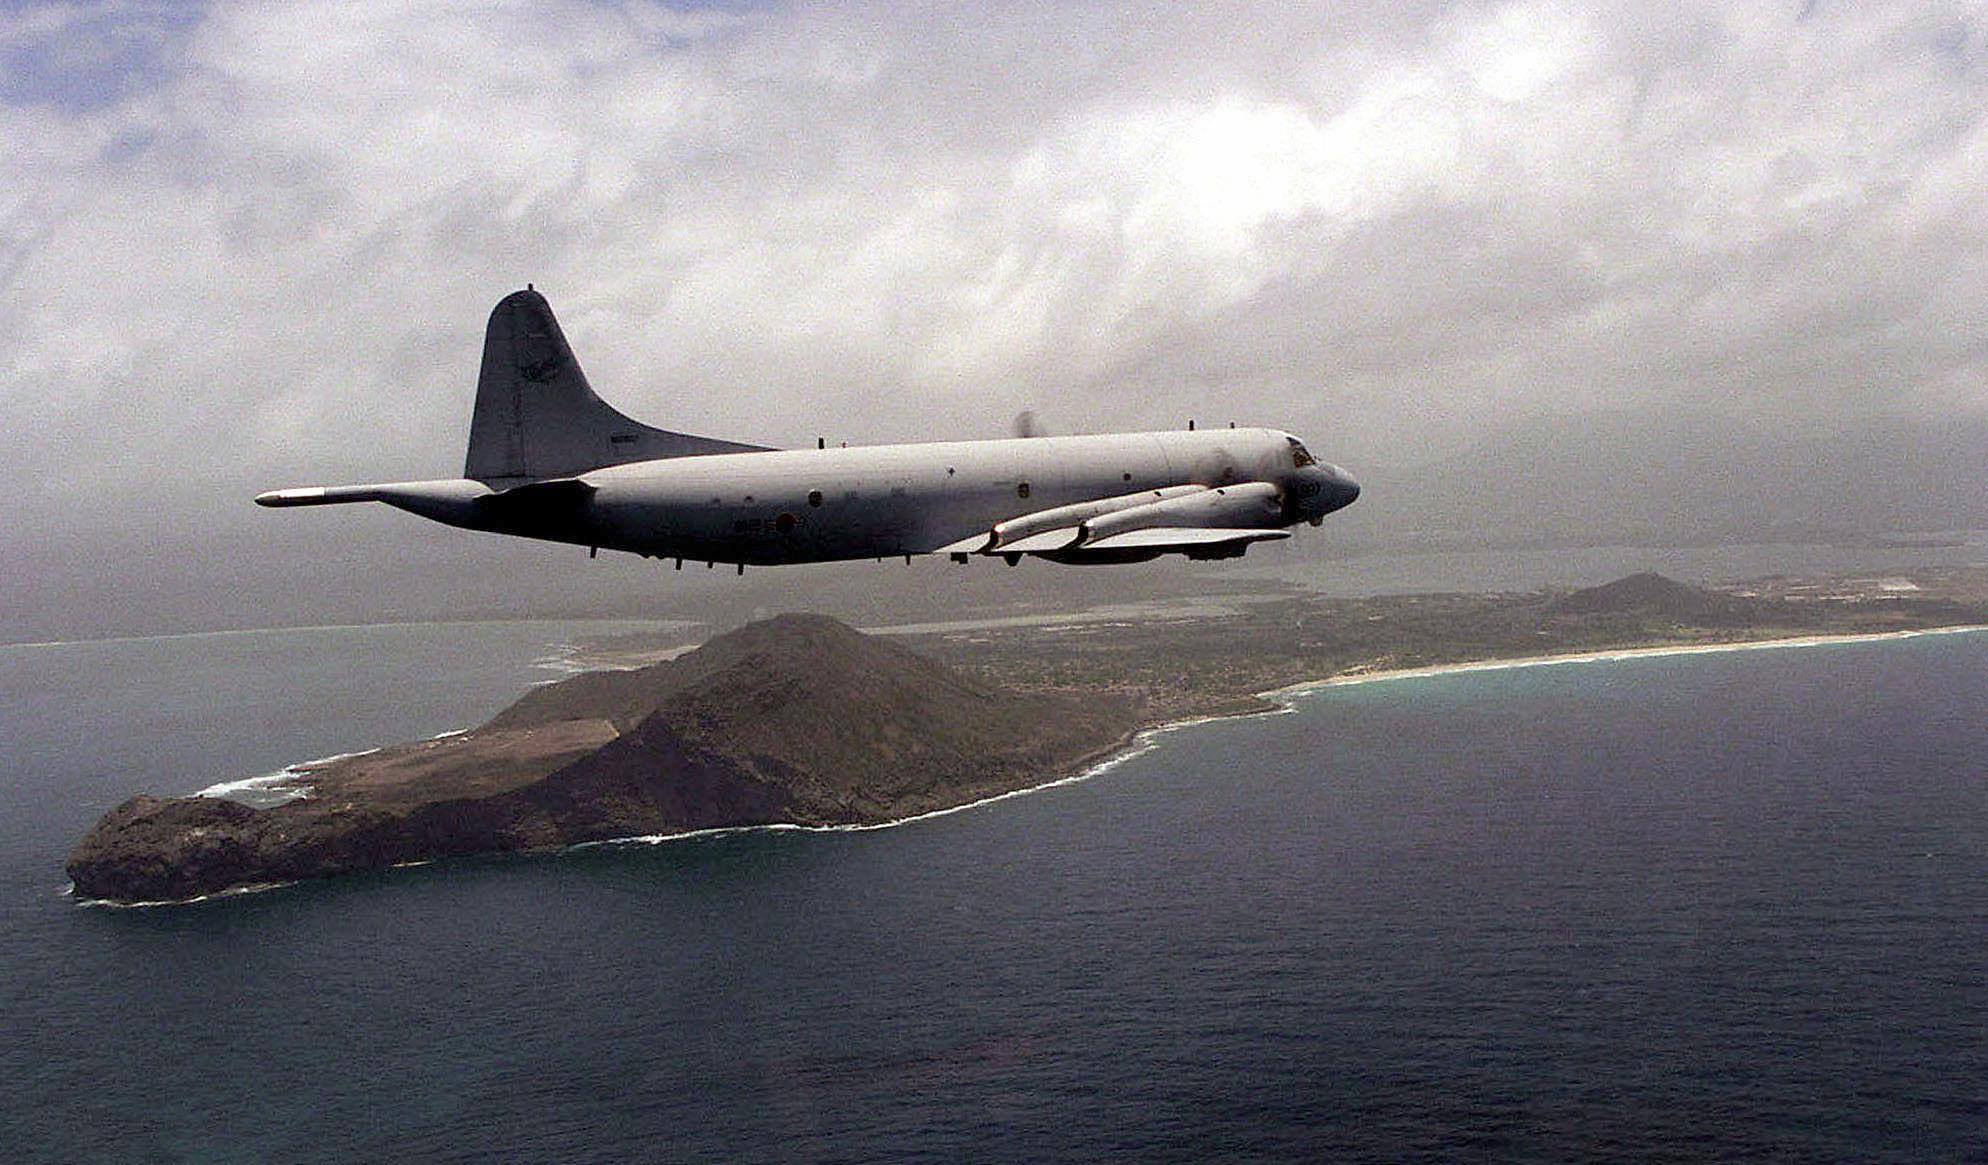 http://upload.wikimedia.org/wikipedia/commons/1/19/P-3_Orion_Republic_of_Korea_Navy.jpeg